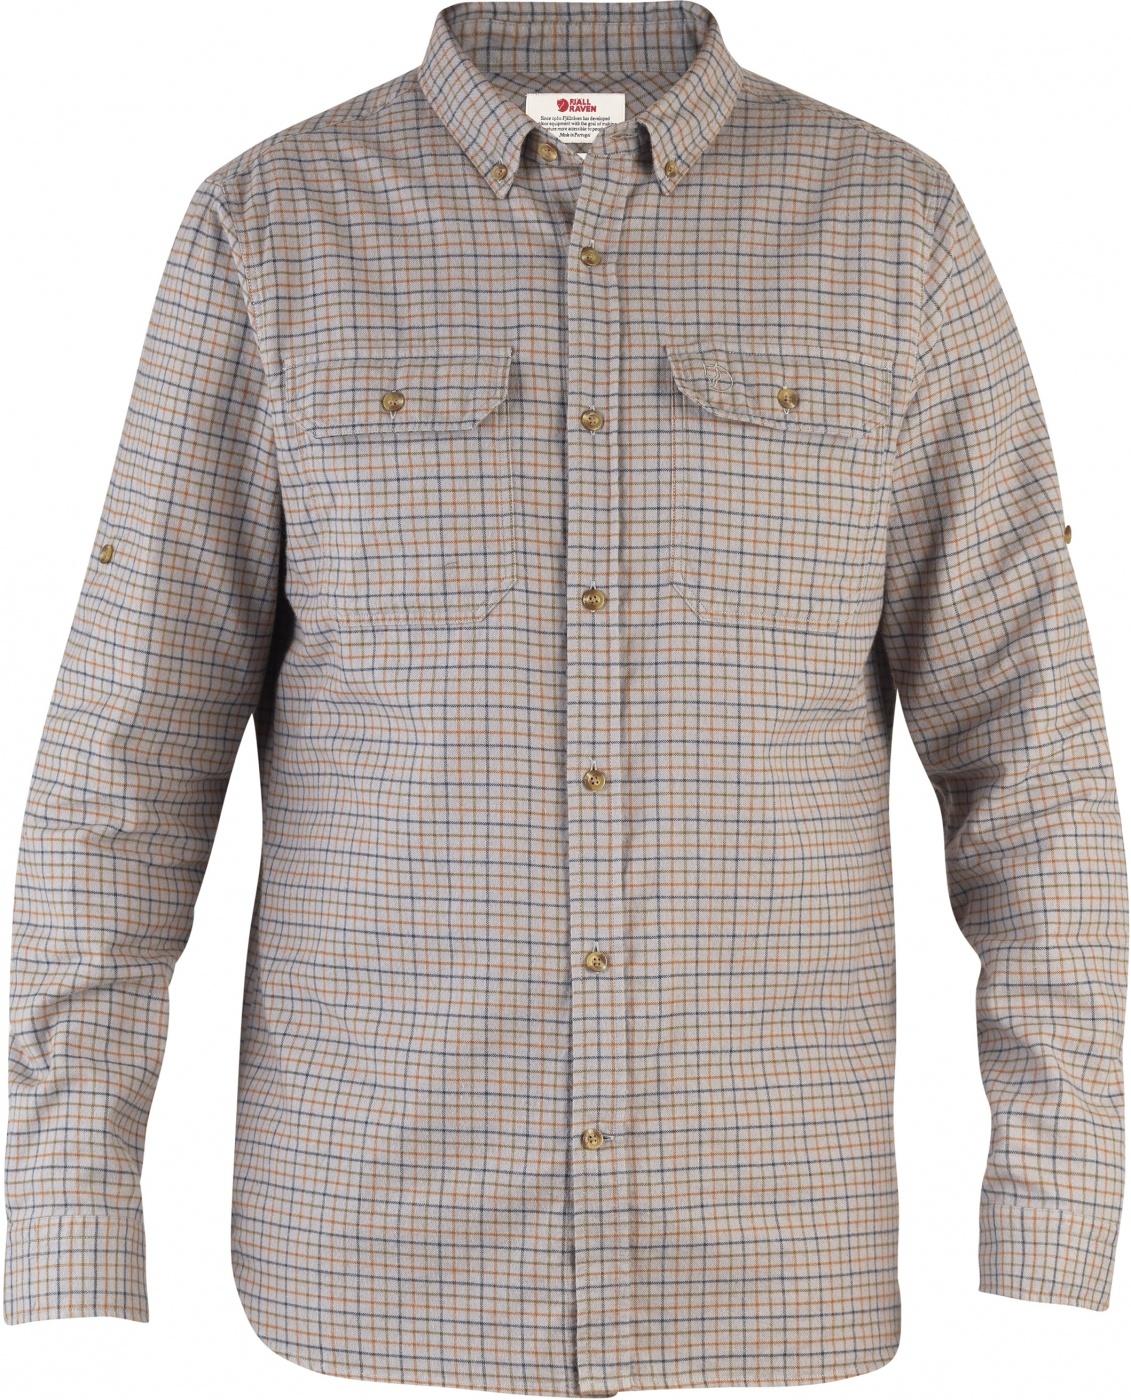 FjallRaven Forest Flannel Shirt Grey-30